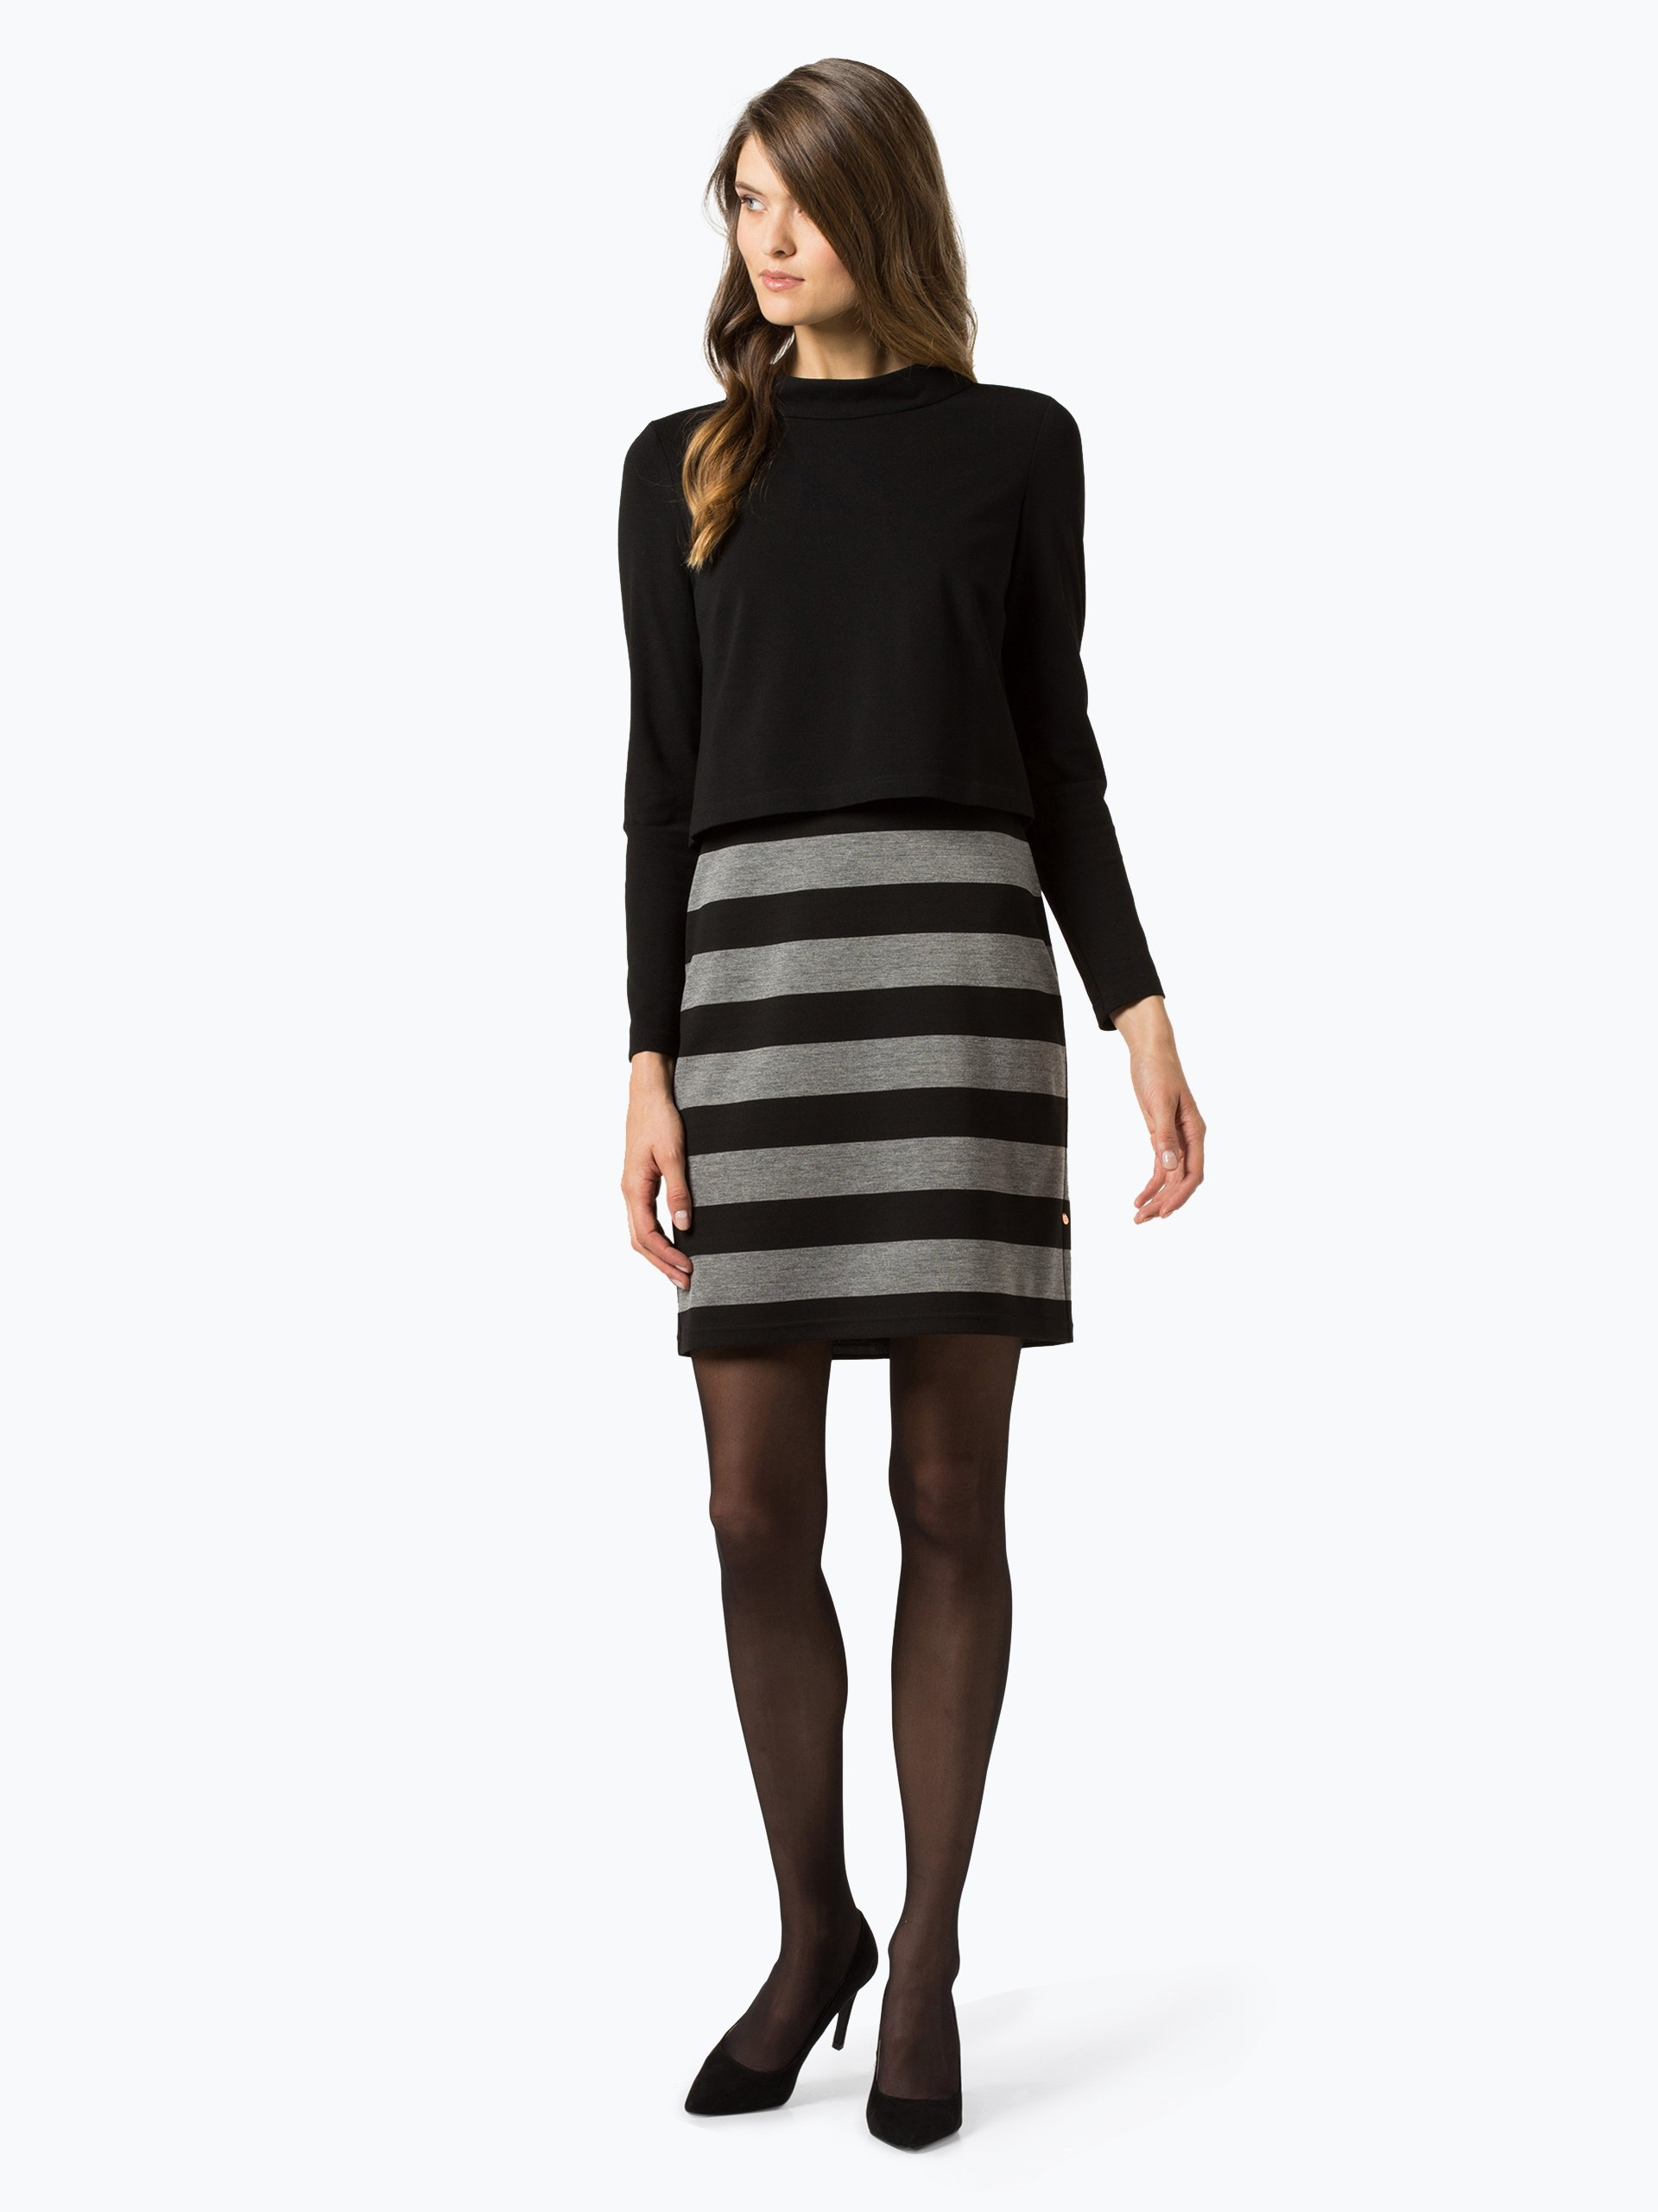 Robe Légère Damen Kleid online kaufen | VANGRAAF.COM